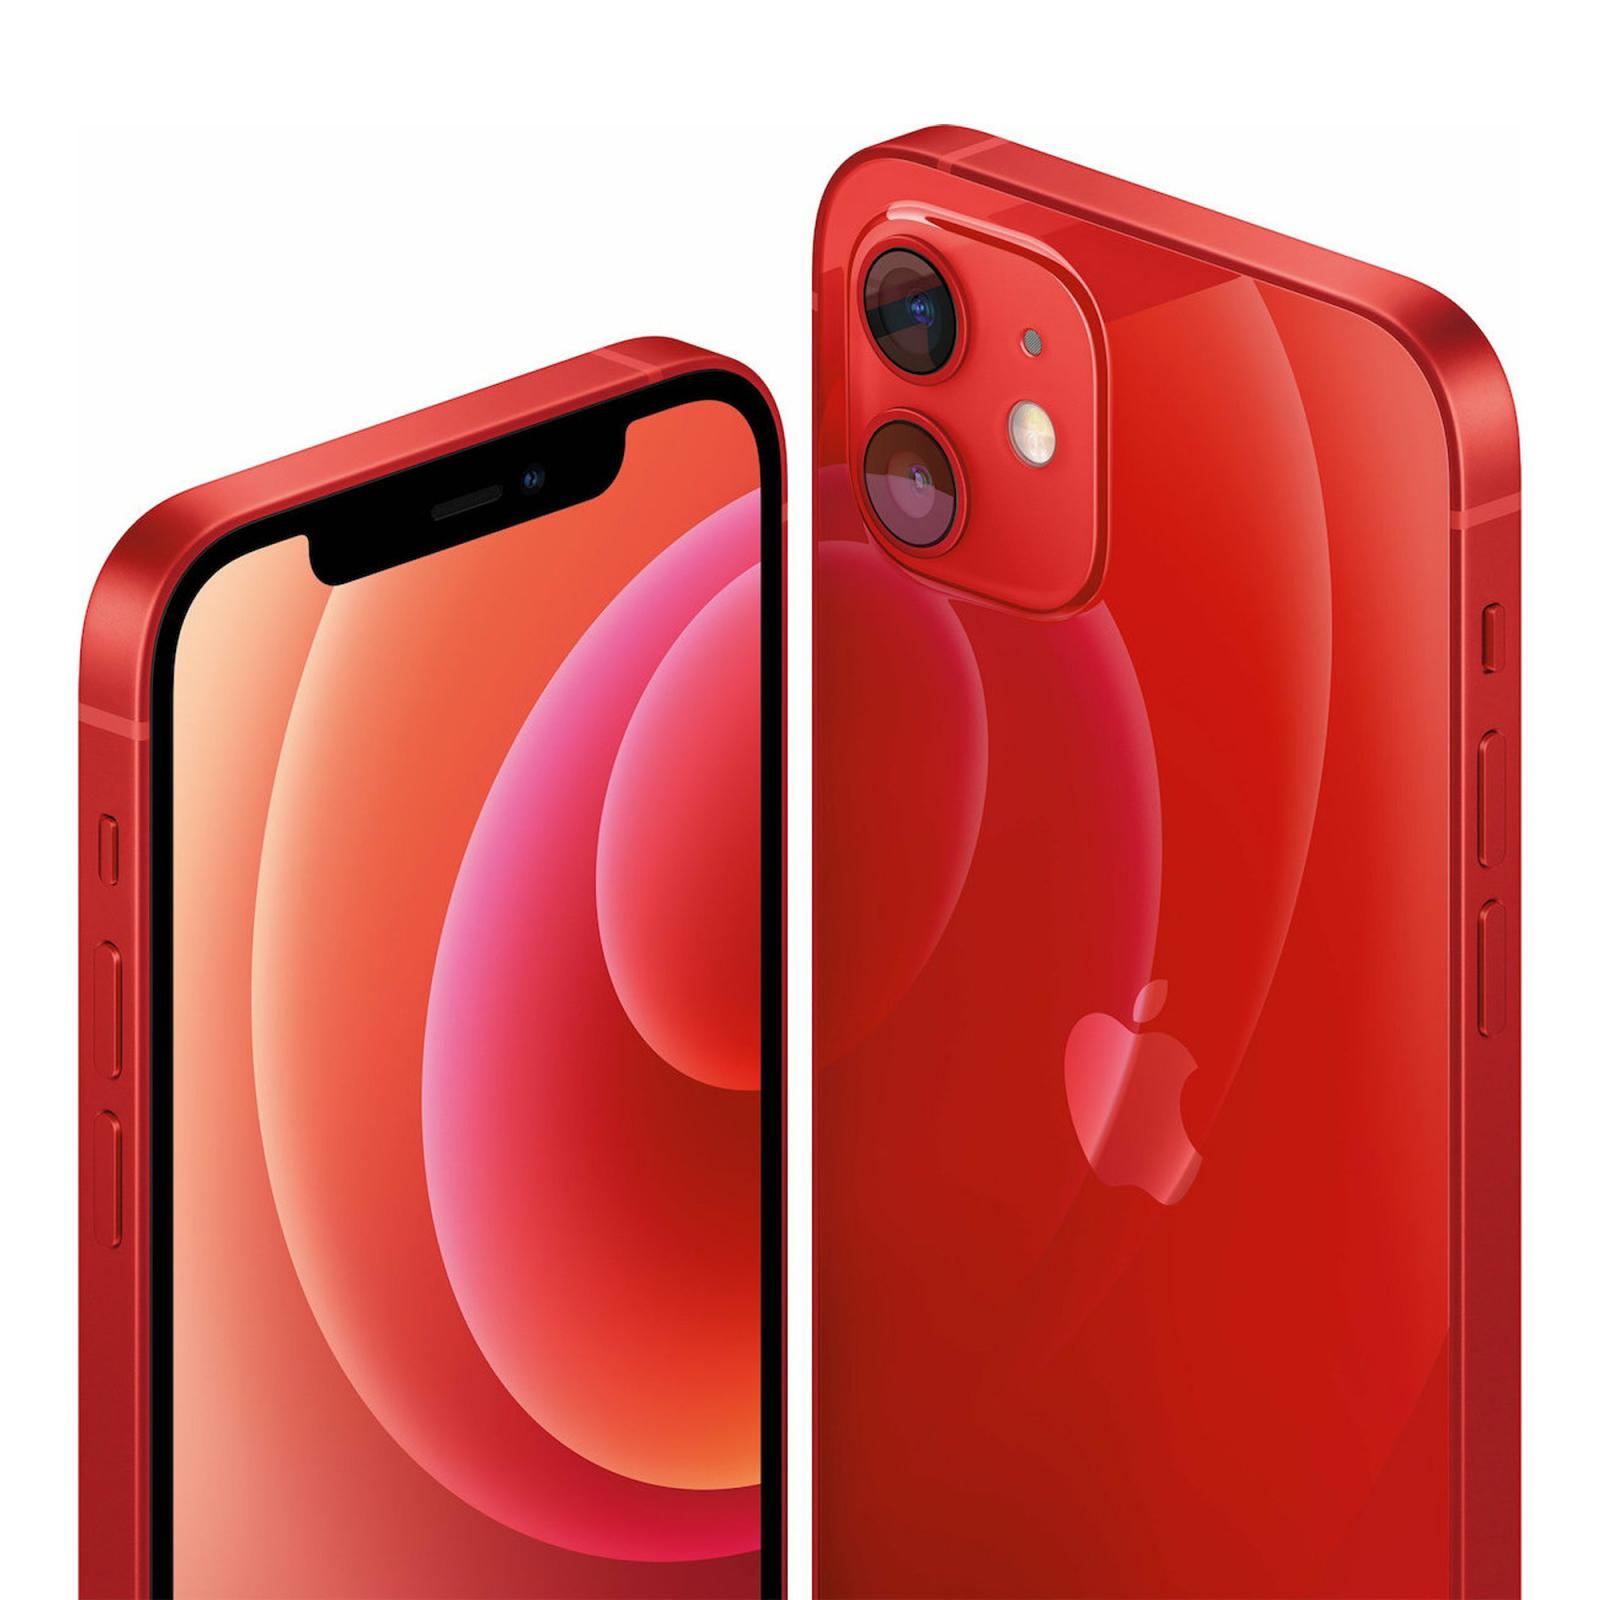 Apple iPhone 12 (64GB) Red